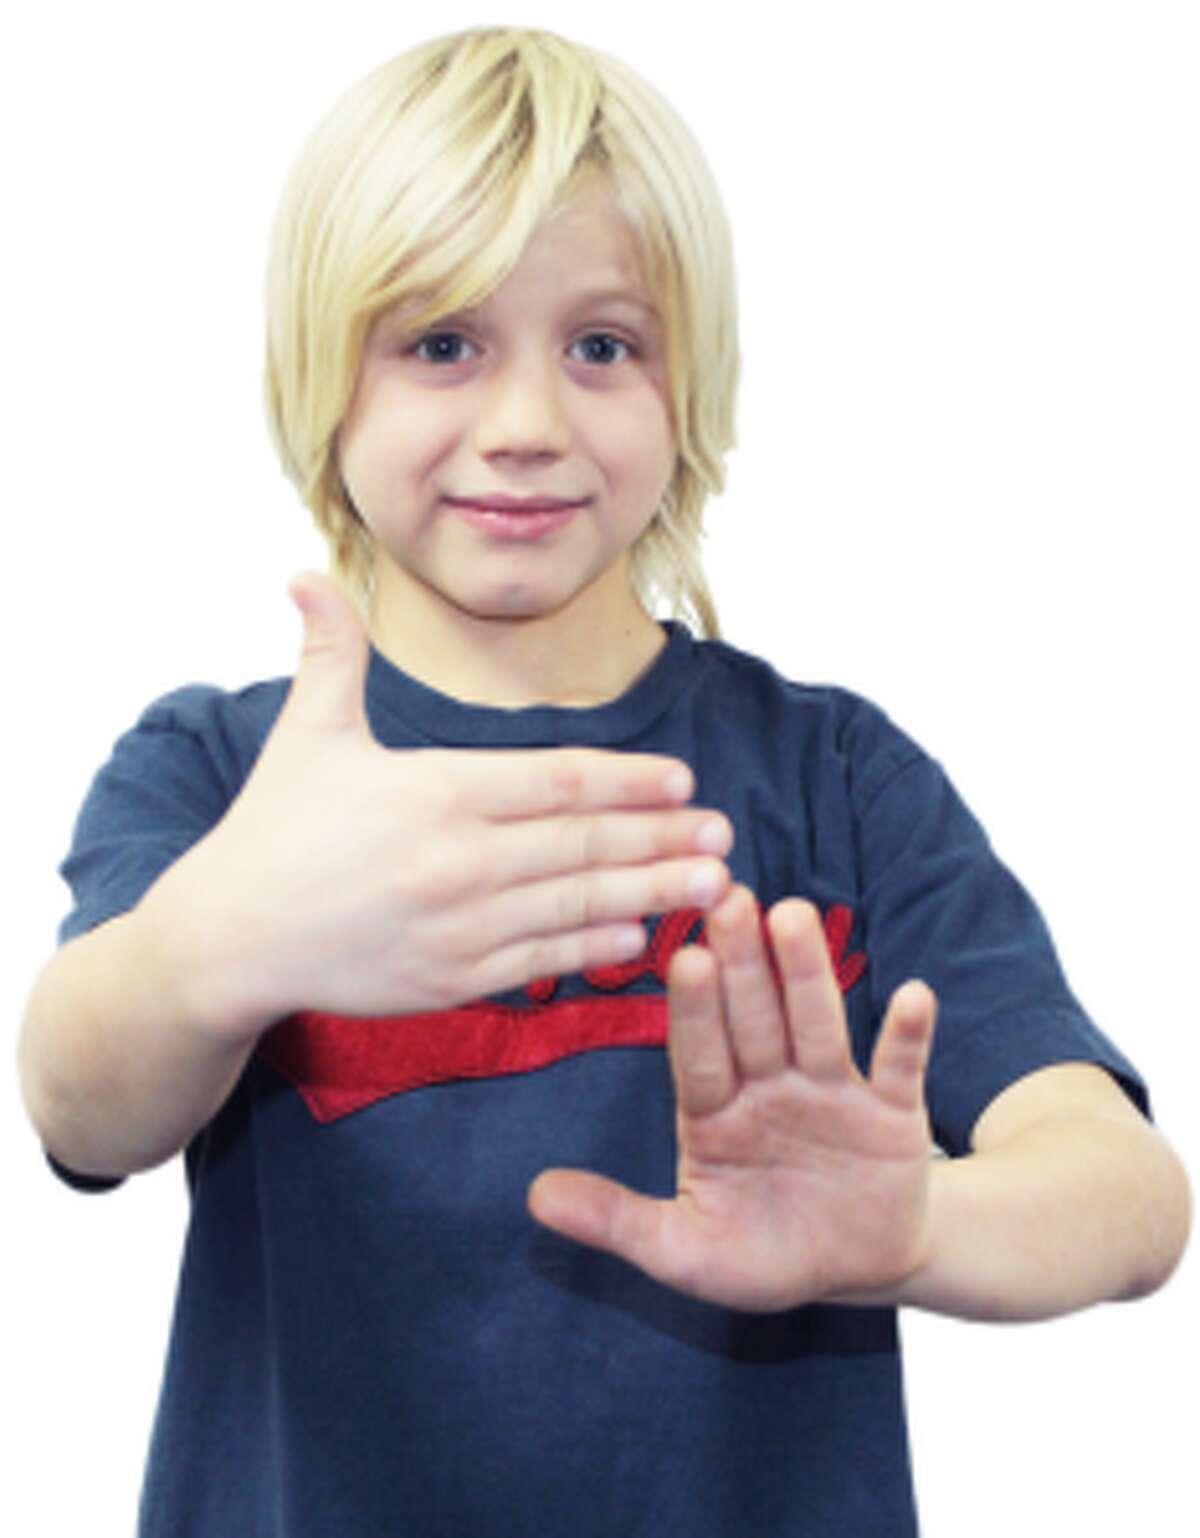 Austin Owen is a third grader at Riverview Elementary School.